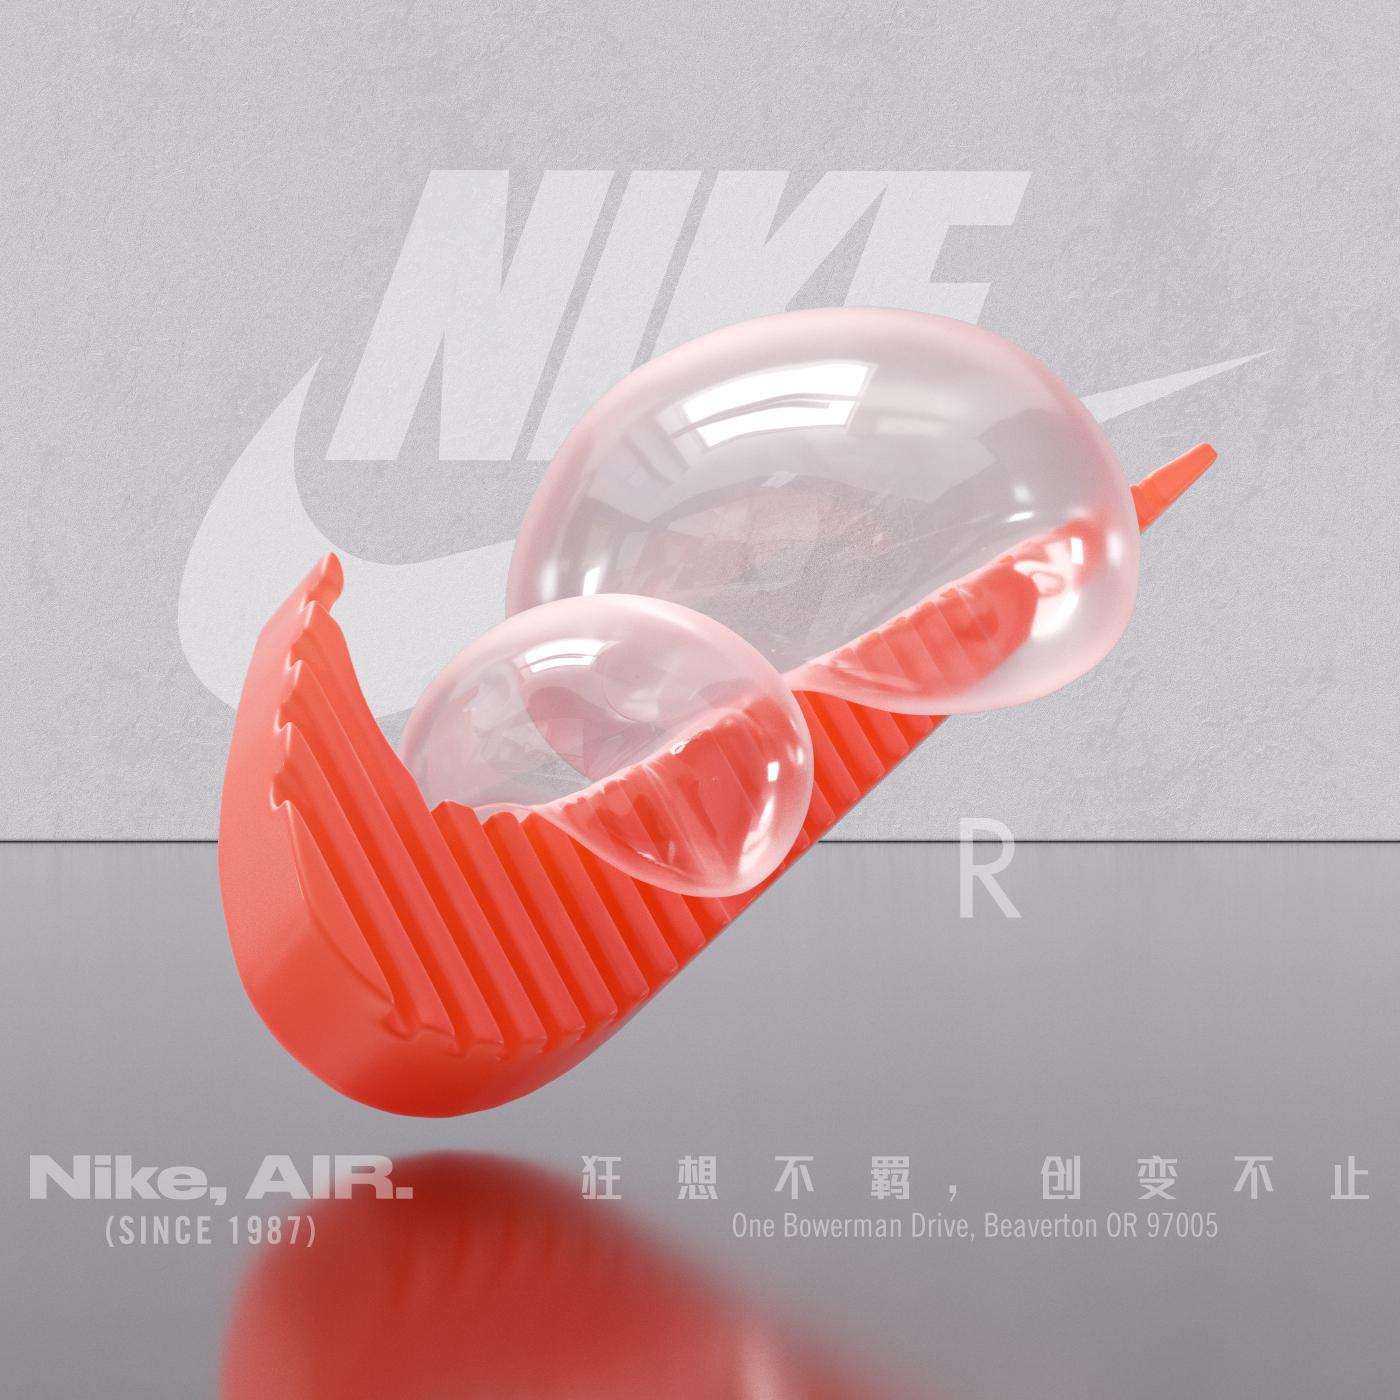 Nike Air Max 720 Illustration & Typography